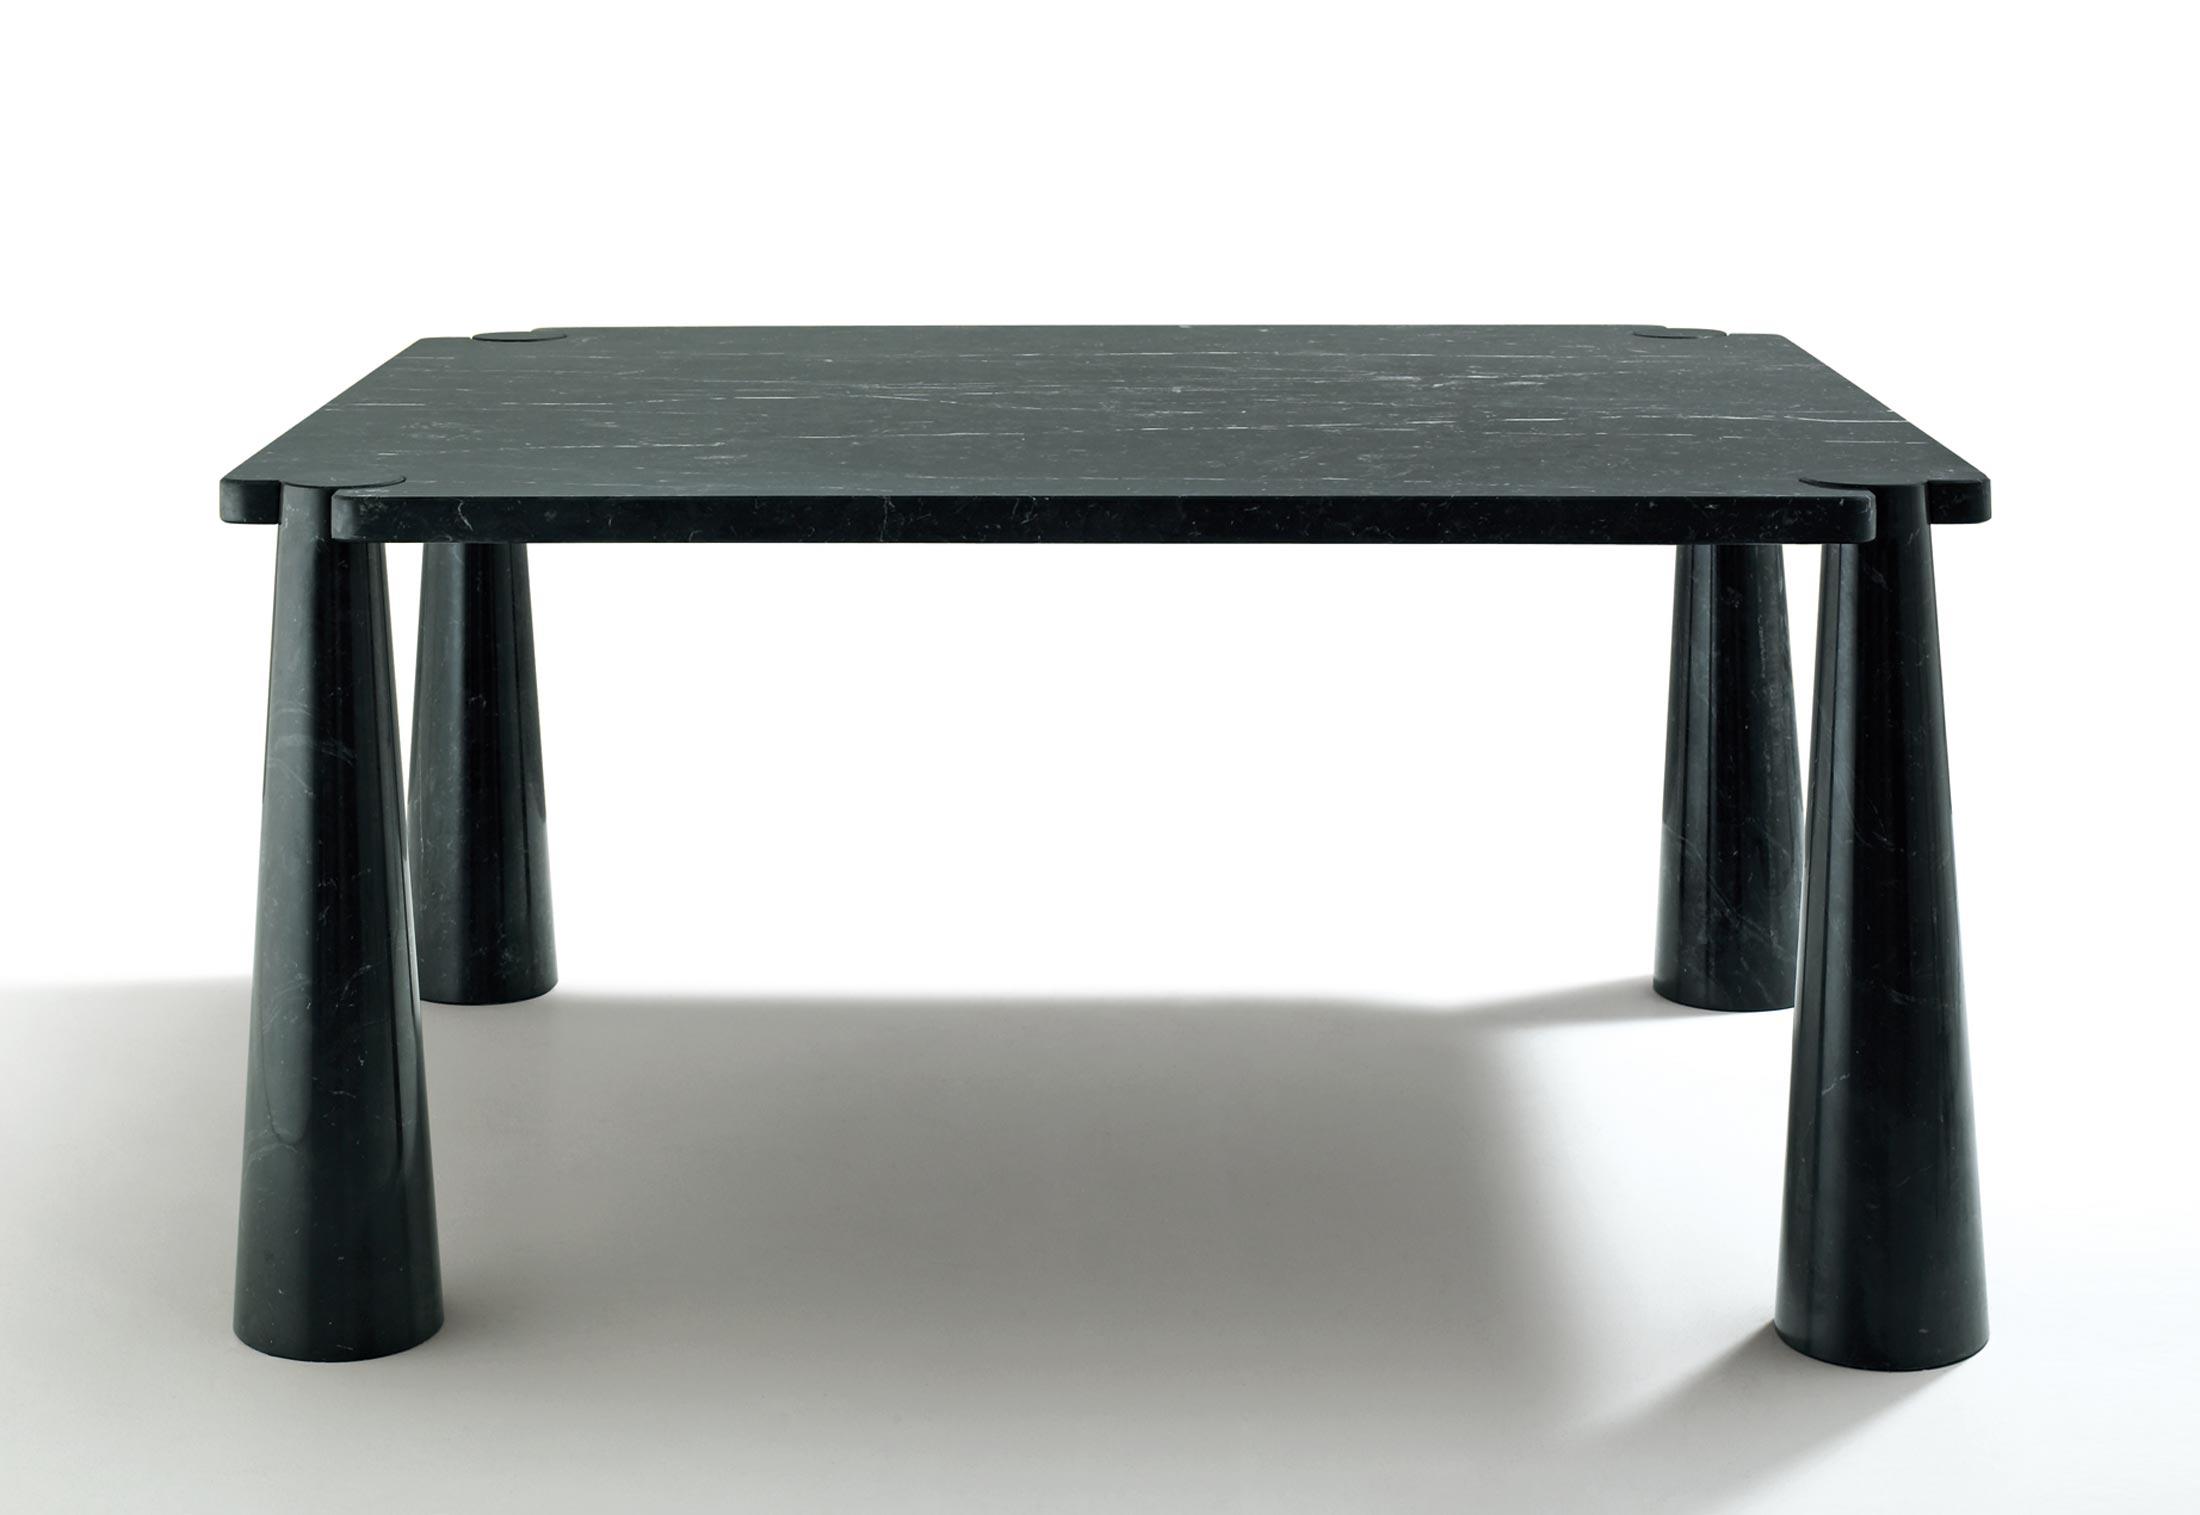 Eros four legged table by AGAPECASA STYLEPARK : eros four legged table 2 from www.stylepark.com size 2200 x 1515 jpeg 114kB